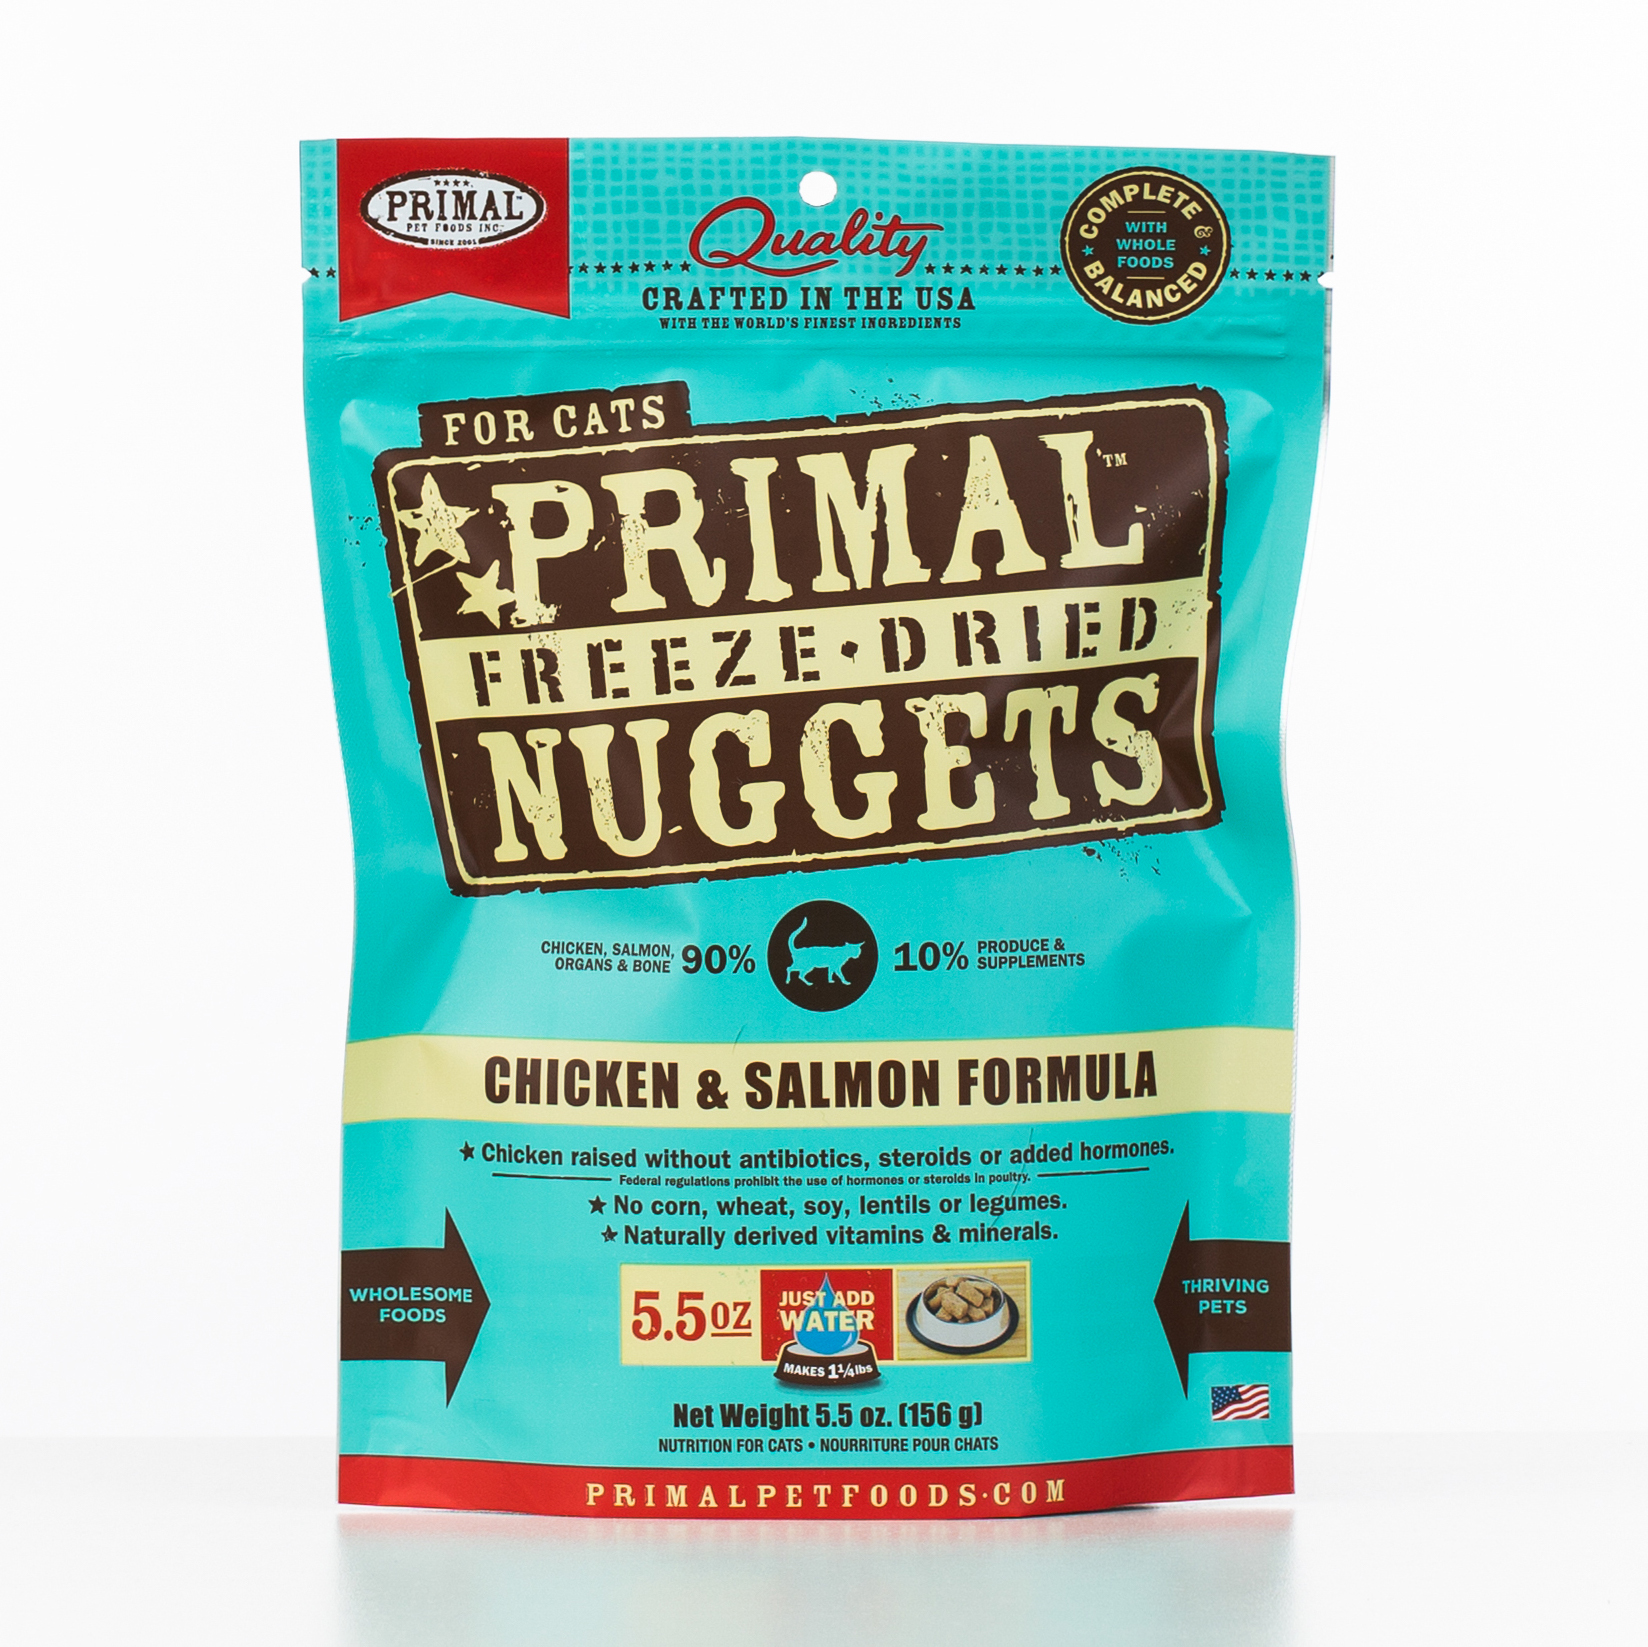 Primal Raw Freeze-Dried Nuggets Chicken & Salmon Formula Cat Food, 5.5-oz bag